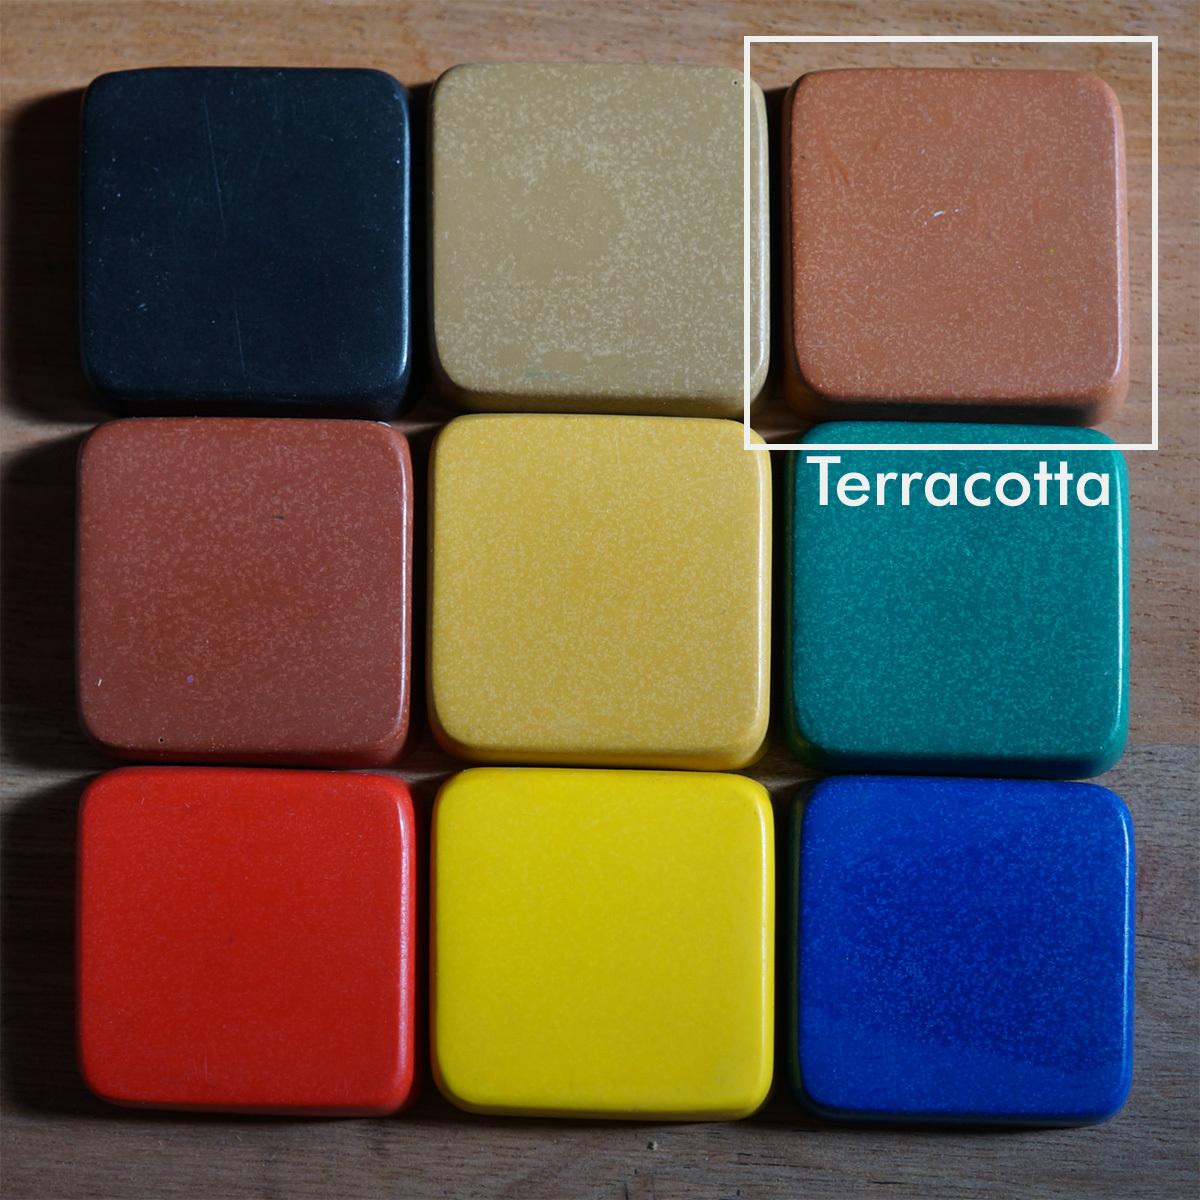 PIGMENT TERRACOTTA 300g(着色剤:テラコッタ 300g) - 画像2